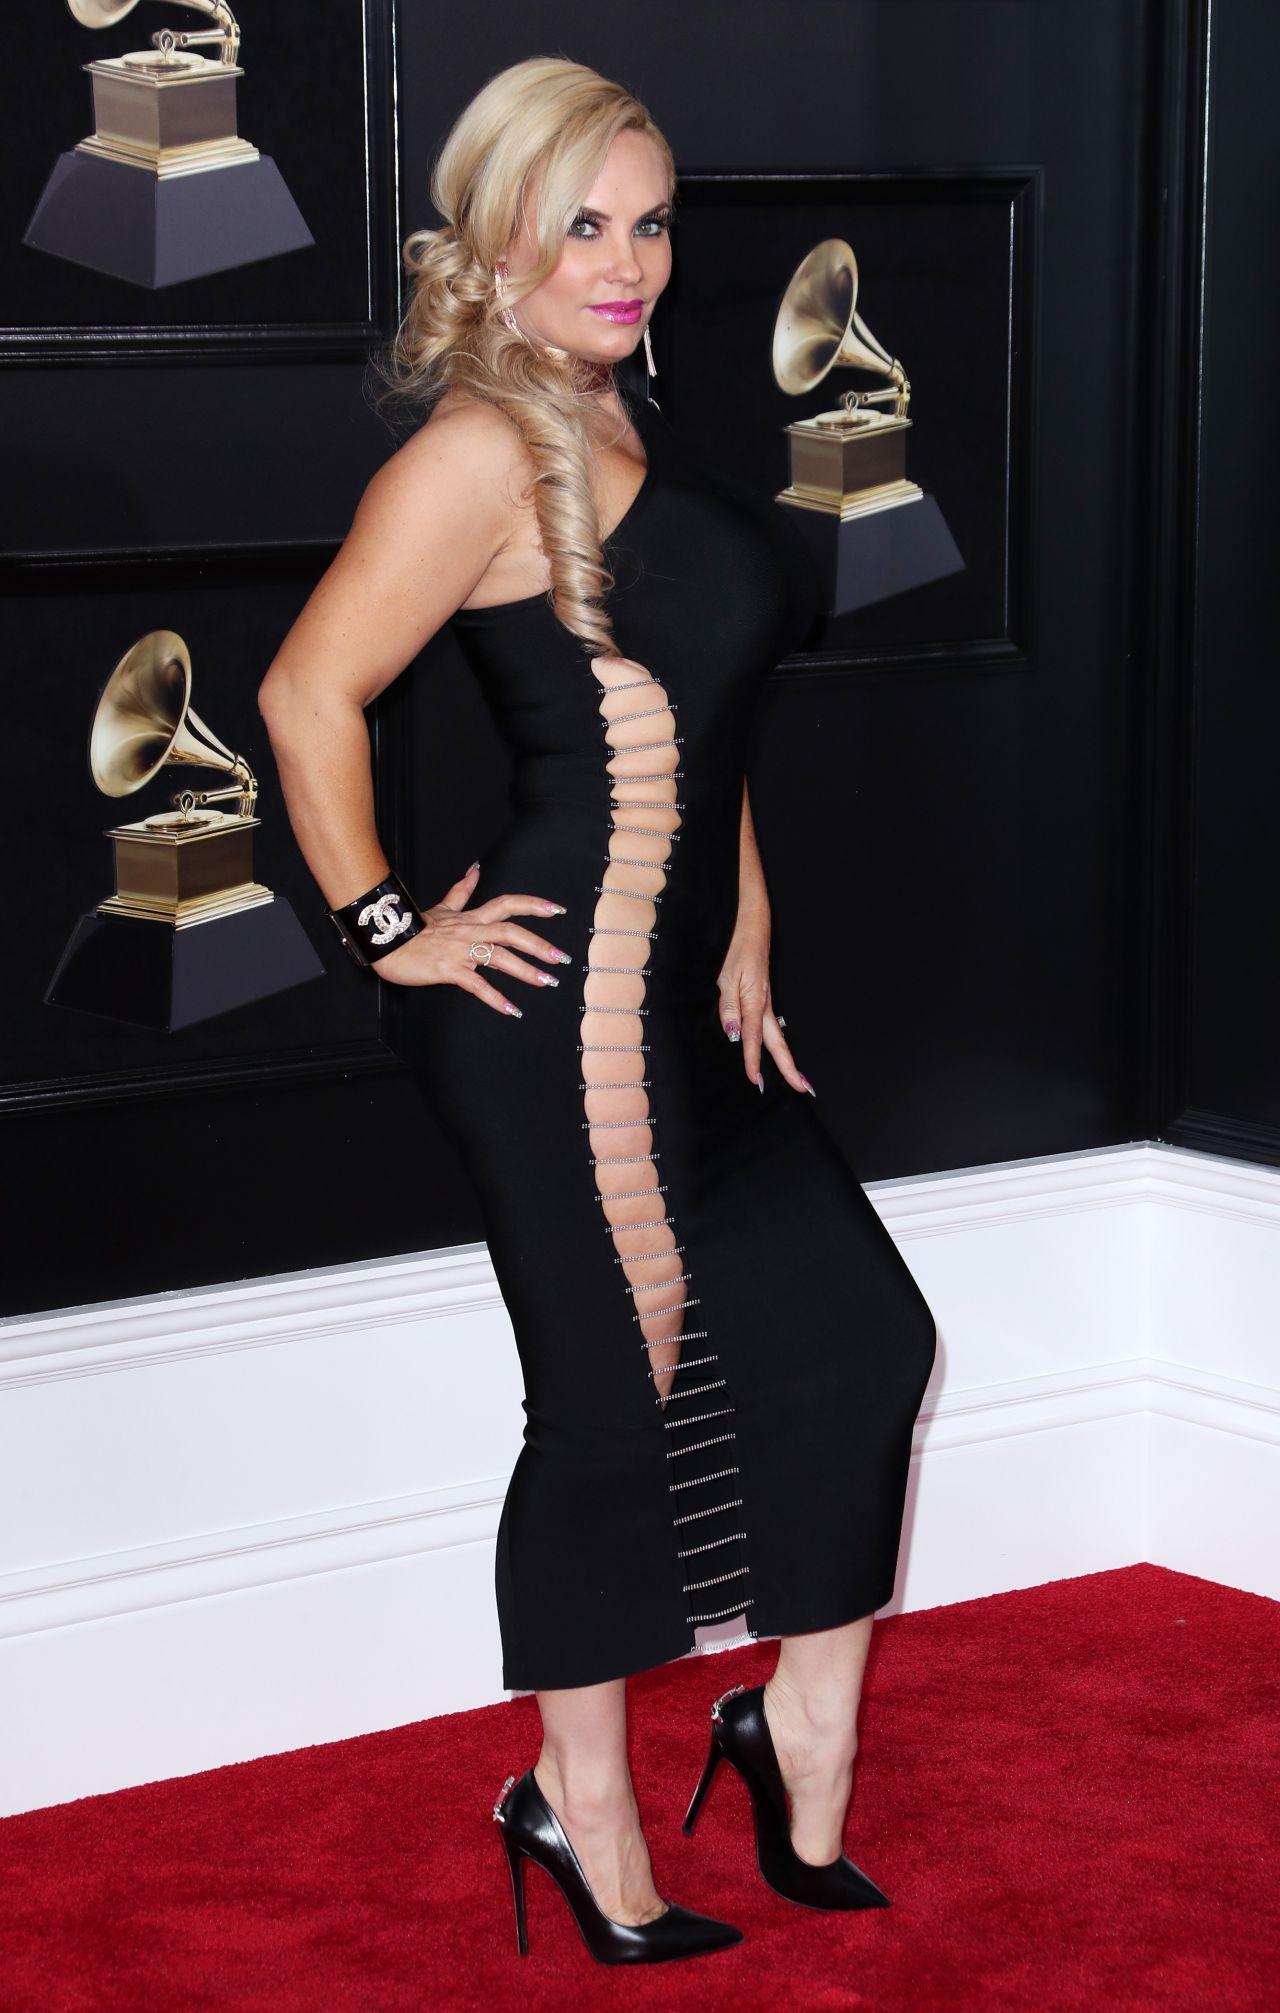 Coco 2018 Grammy Awards In New York